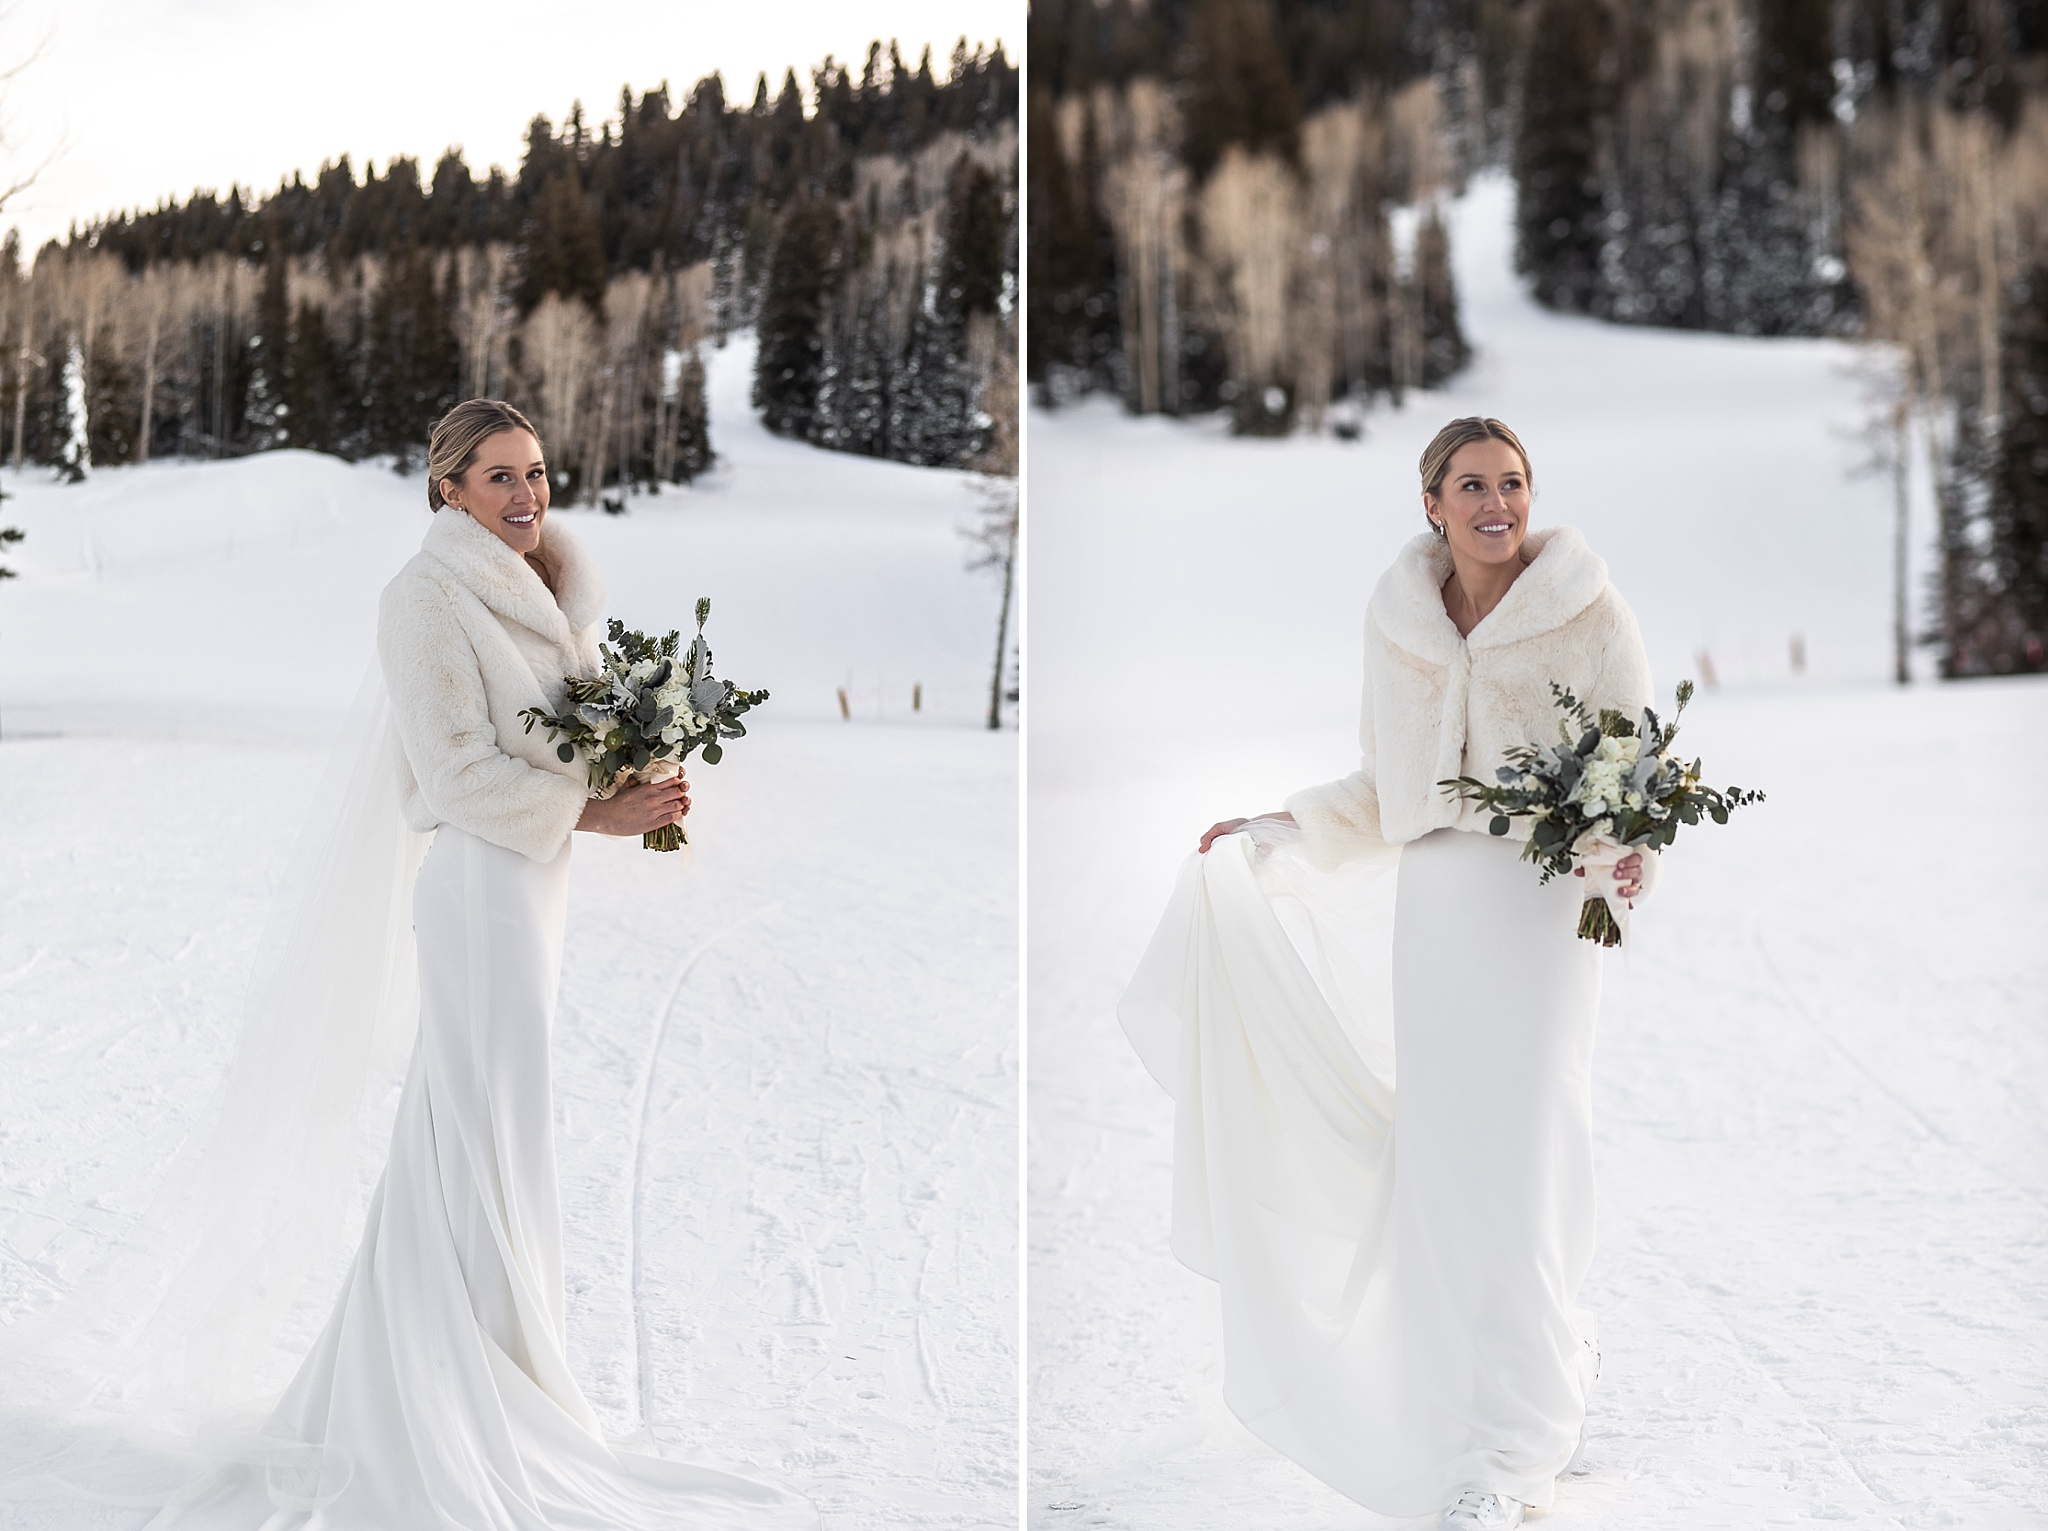 Park-City-Utah-Winter-Wedding-0043